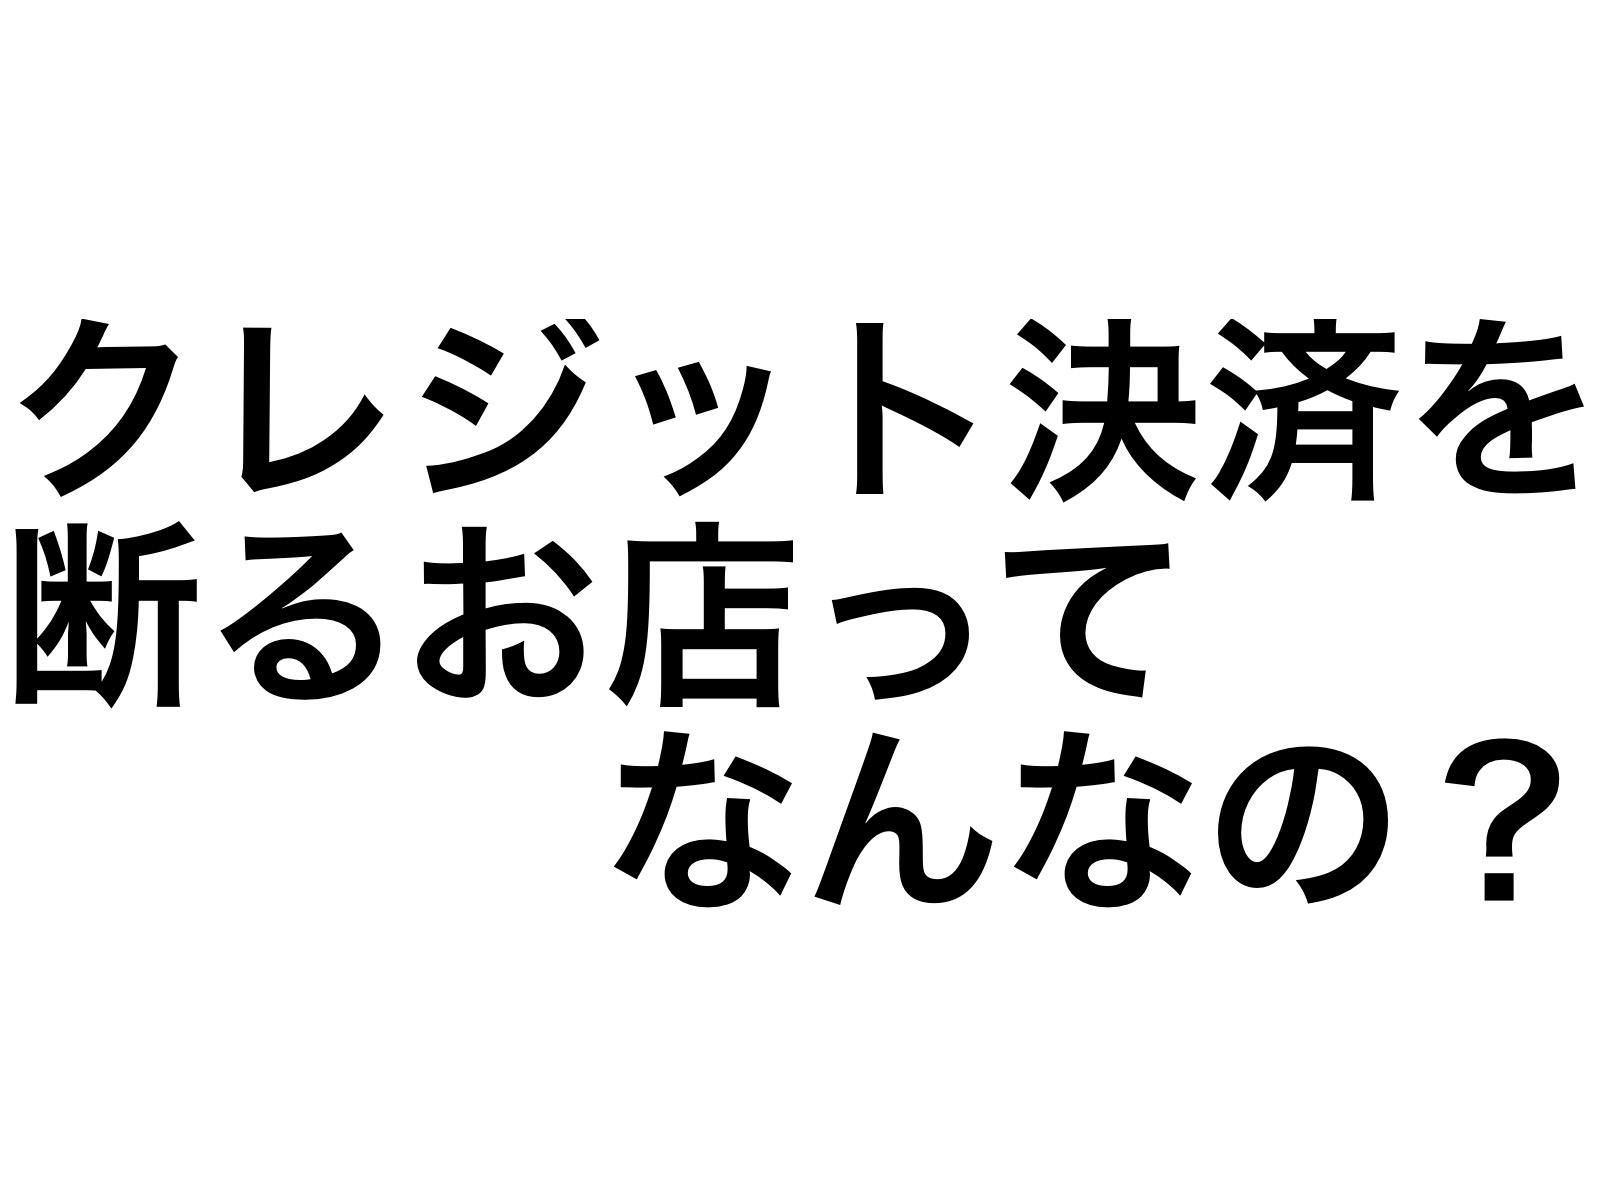 2017 02 04 19 49 24